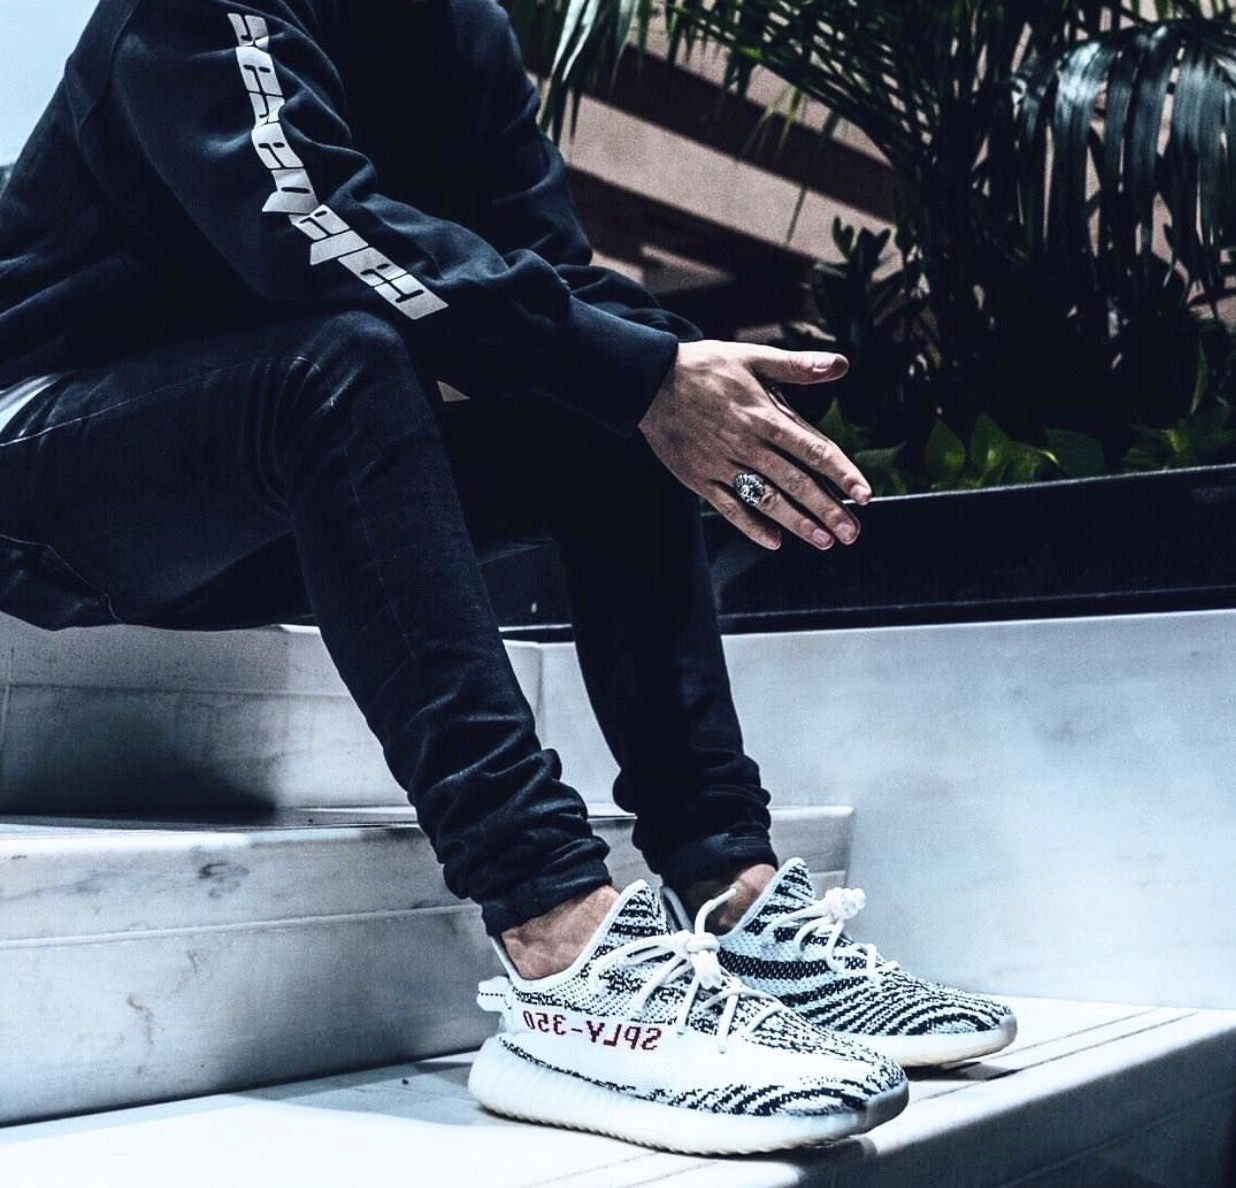 aaf2752fd Adidas Calabasas   Yeezy Boost 350 V2 Zebra Follow  IllumiLondon for more  Streetwear Collections  IllumiLondon